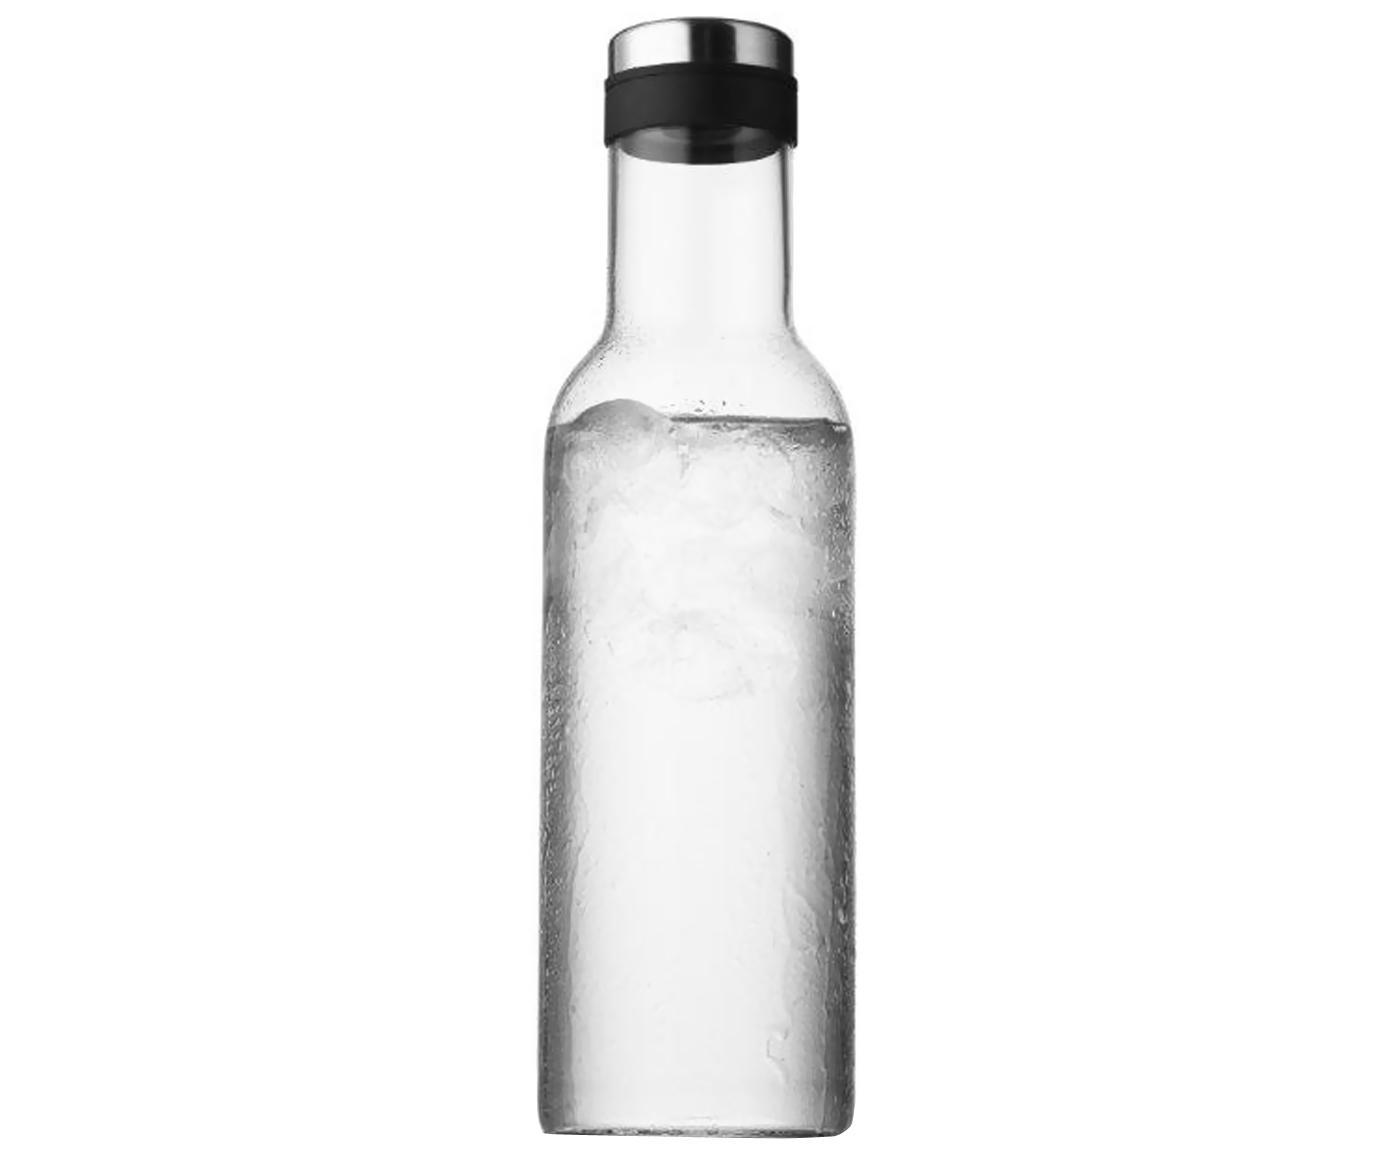 Karaffe Norm mit silbernem Deckel, Glas mundgeblasen, Silikon, Transparent, 1 l